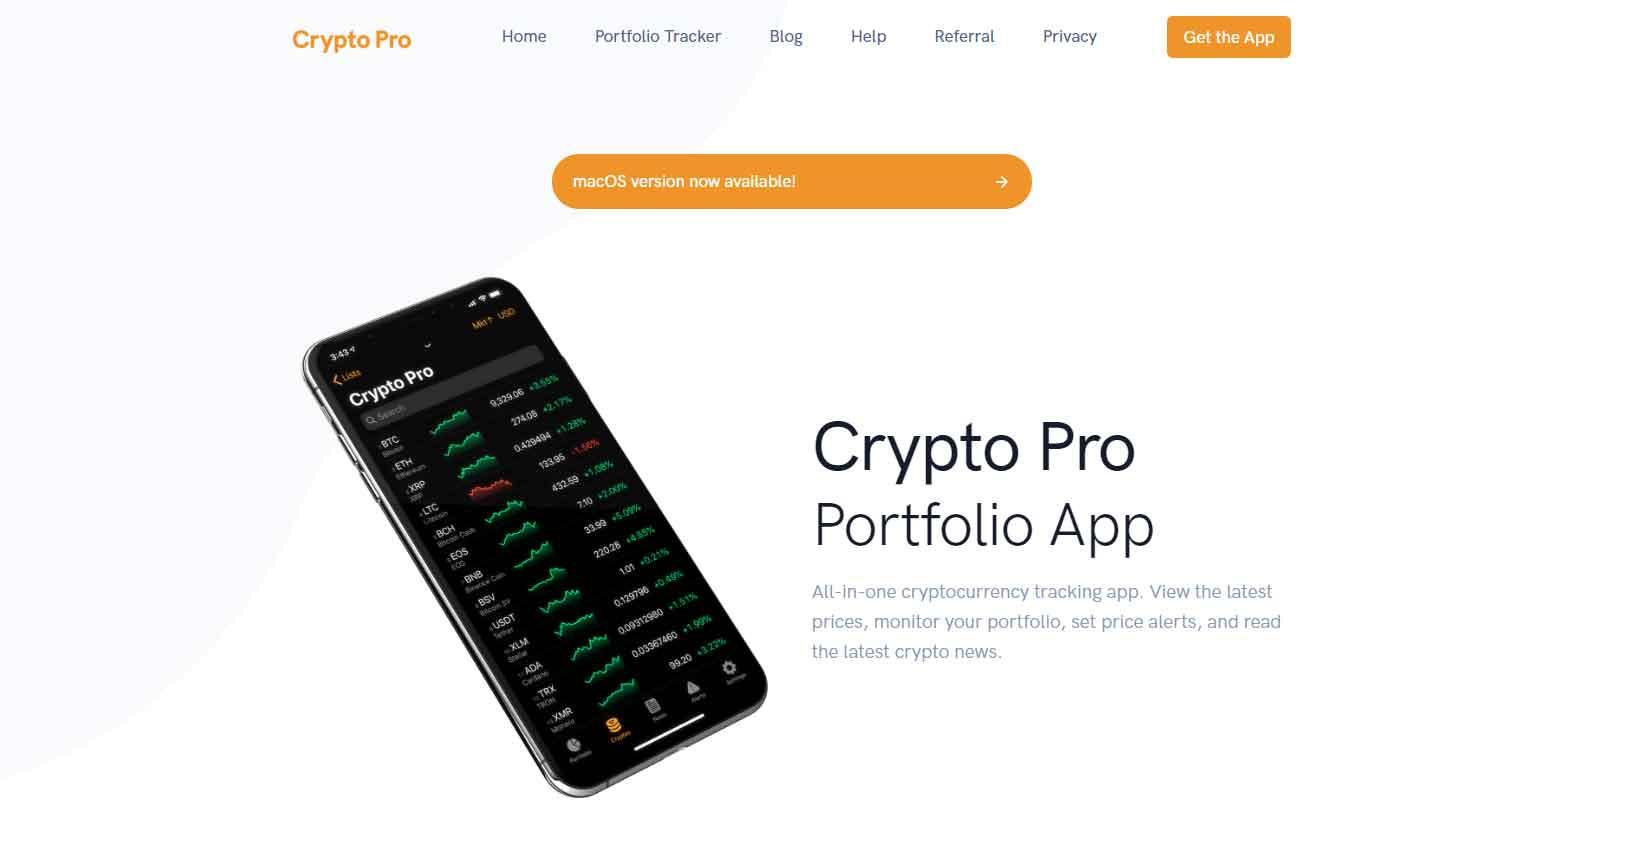 CryptoPro crypto portfolio tracker